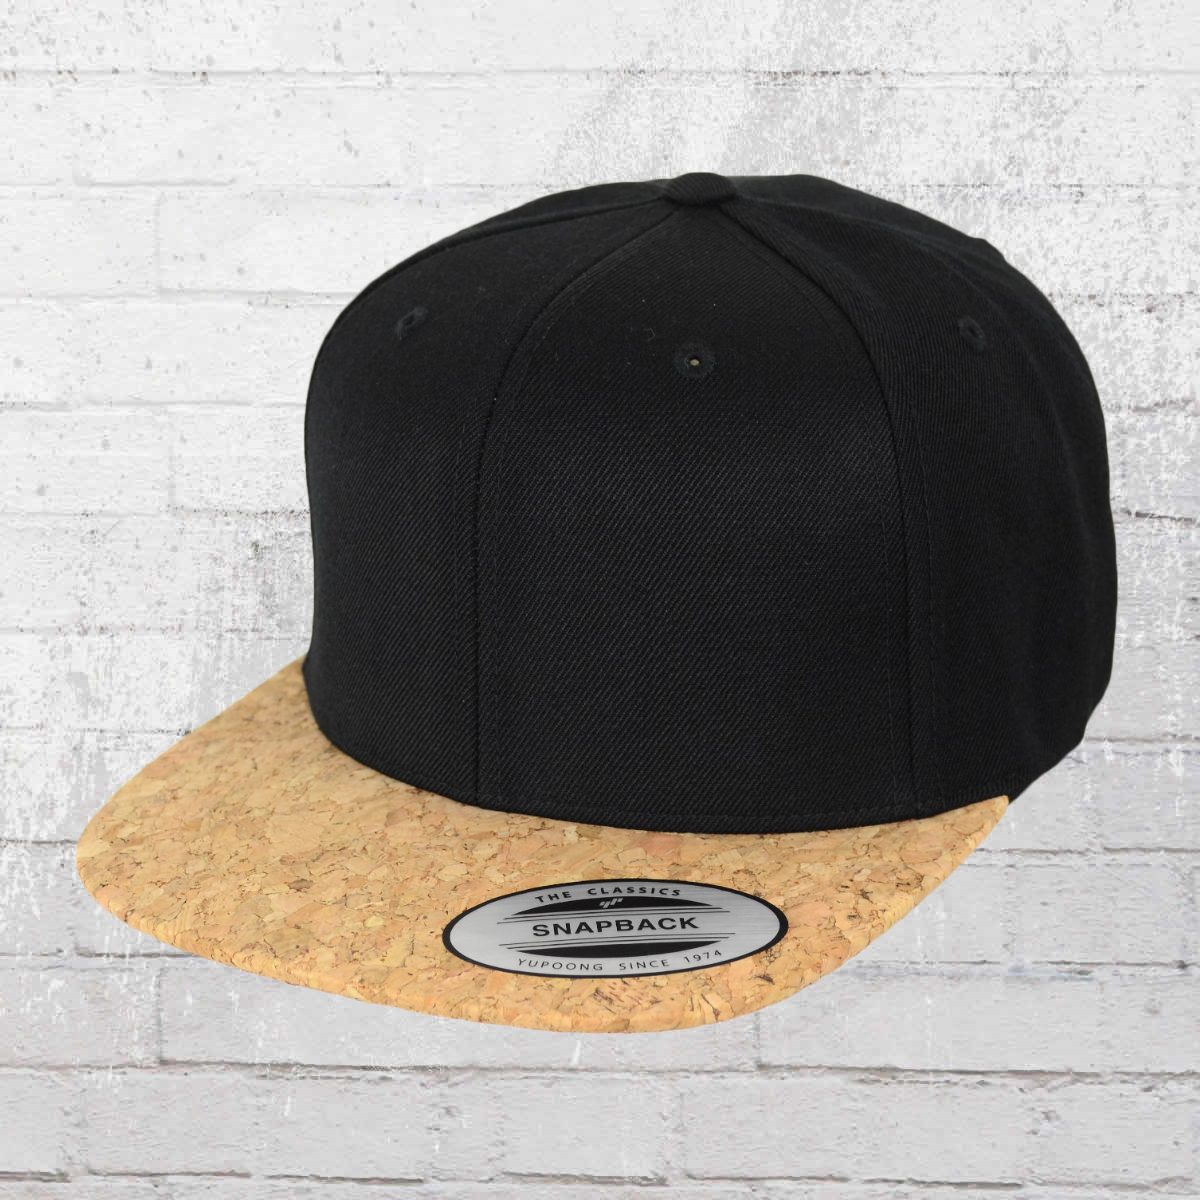 Jetzt bestellen | Yupoong Cork Snapback Cap schwarz kork | krasse ...